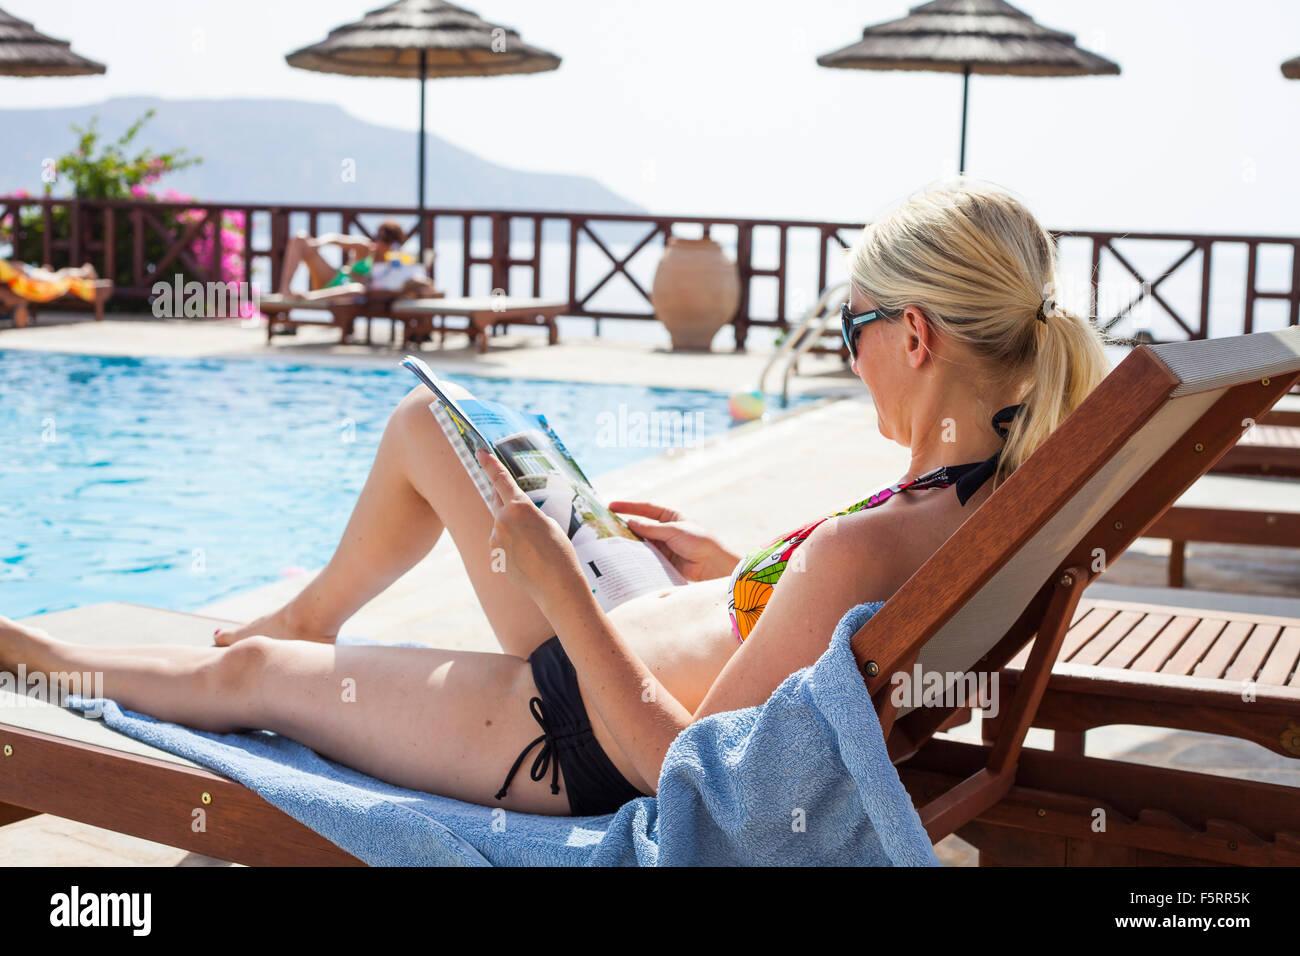 Griechenland, Karpathos Amopi, Magazin Woman lesen am pool Stockbild